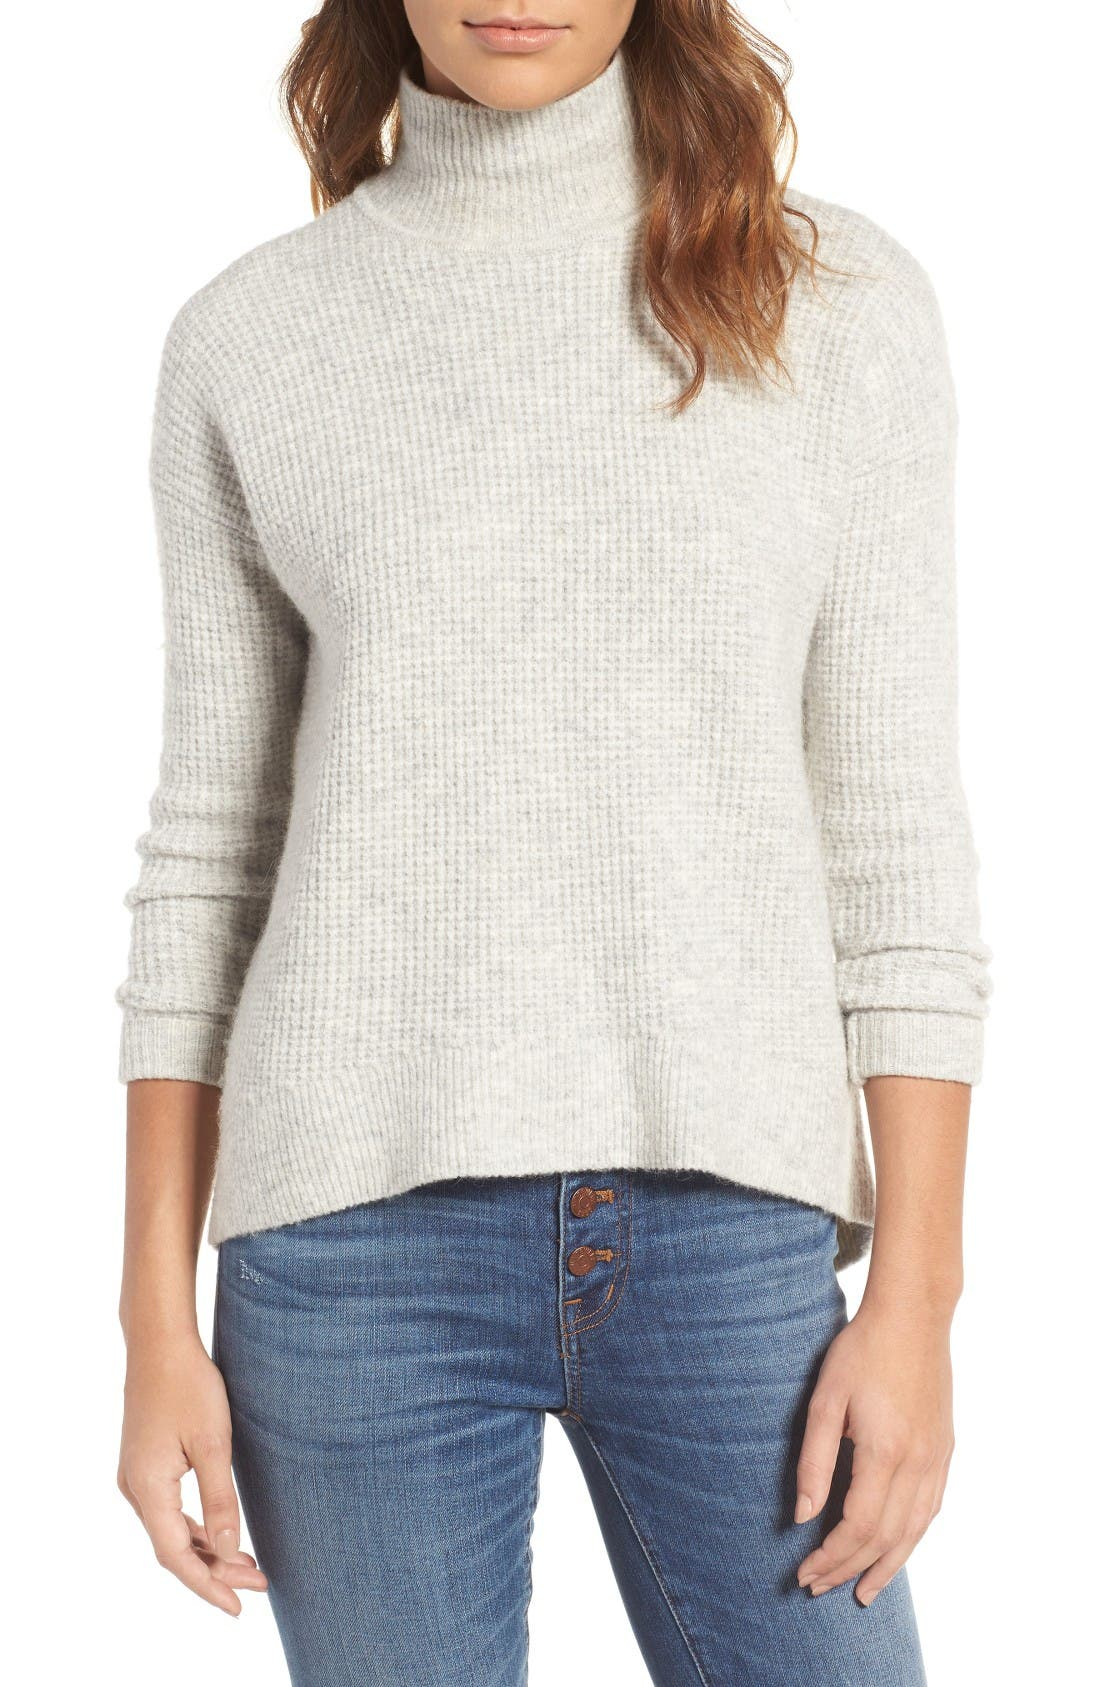 Alternate Image 1 Selected - Madewell Wafflestitch Turtleneck Sweater